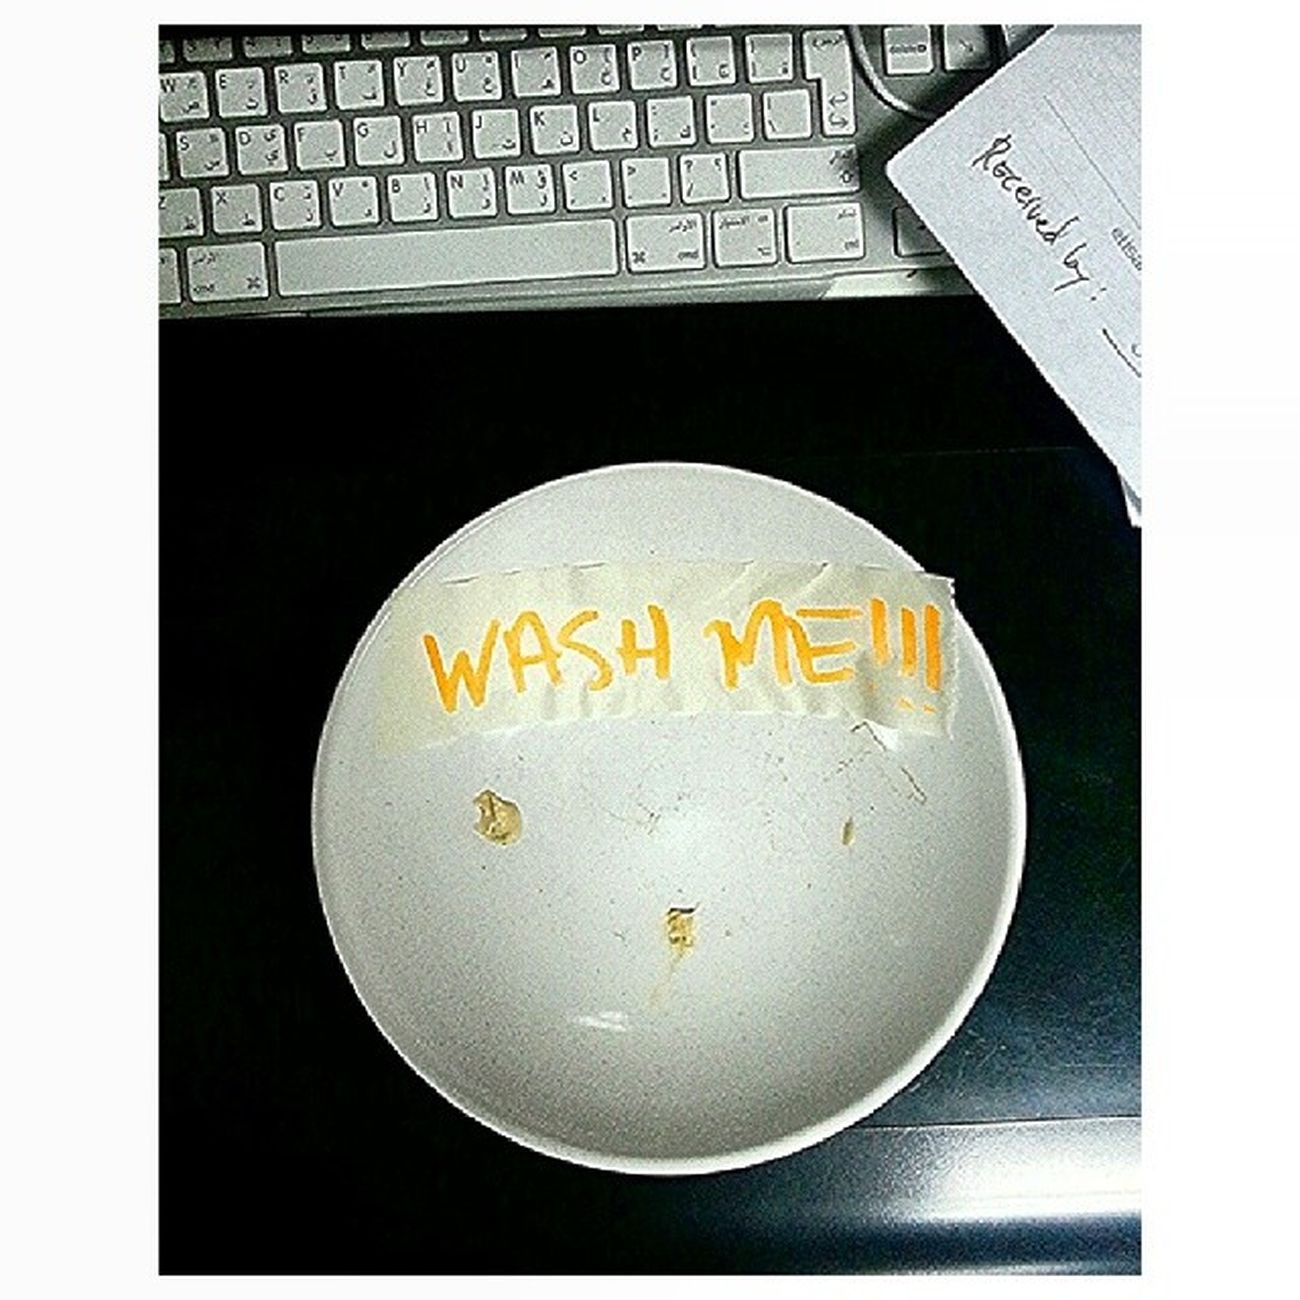 Wash me! Wash me! Bossnote Washme